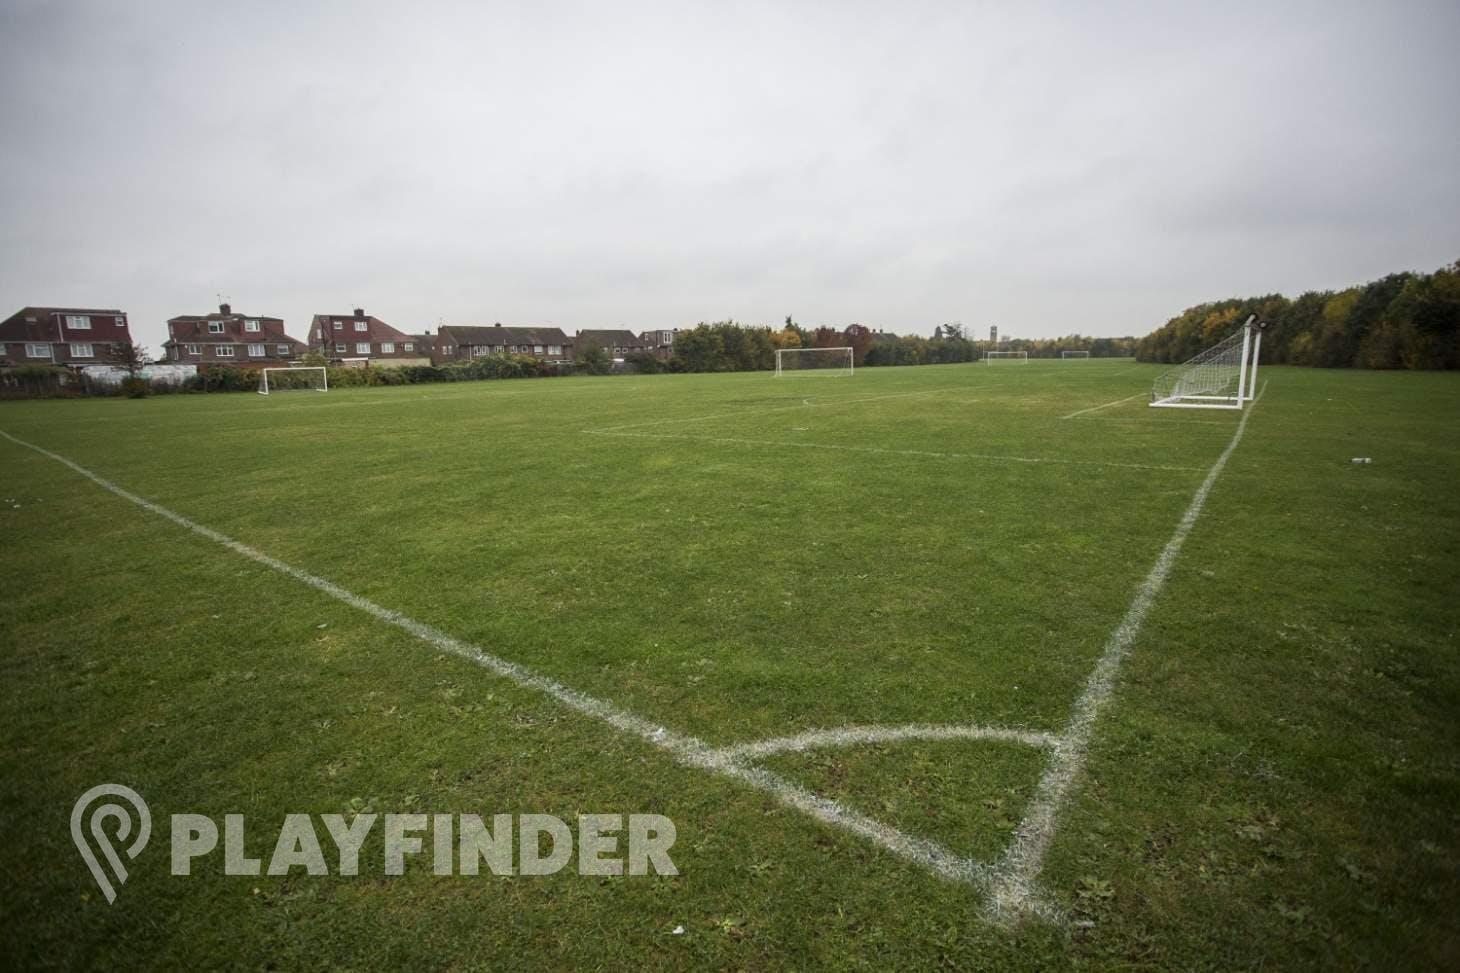 Barnhill Community School Union | Grass rugby pitch